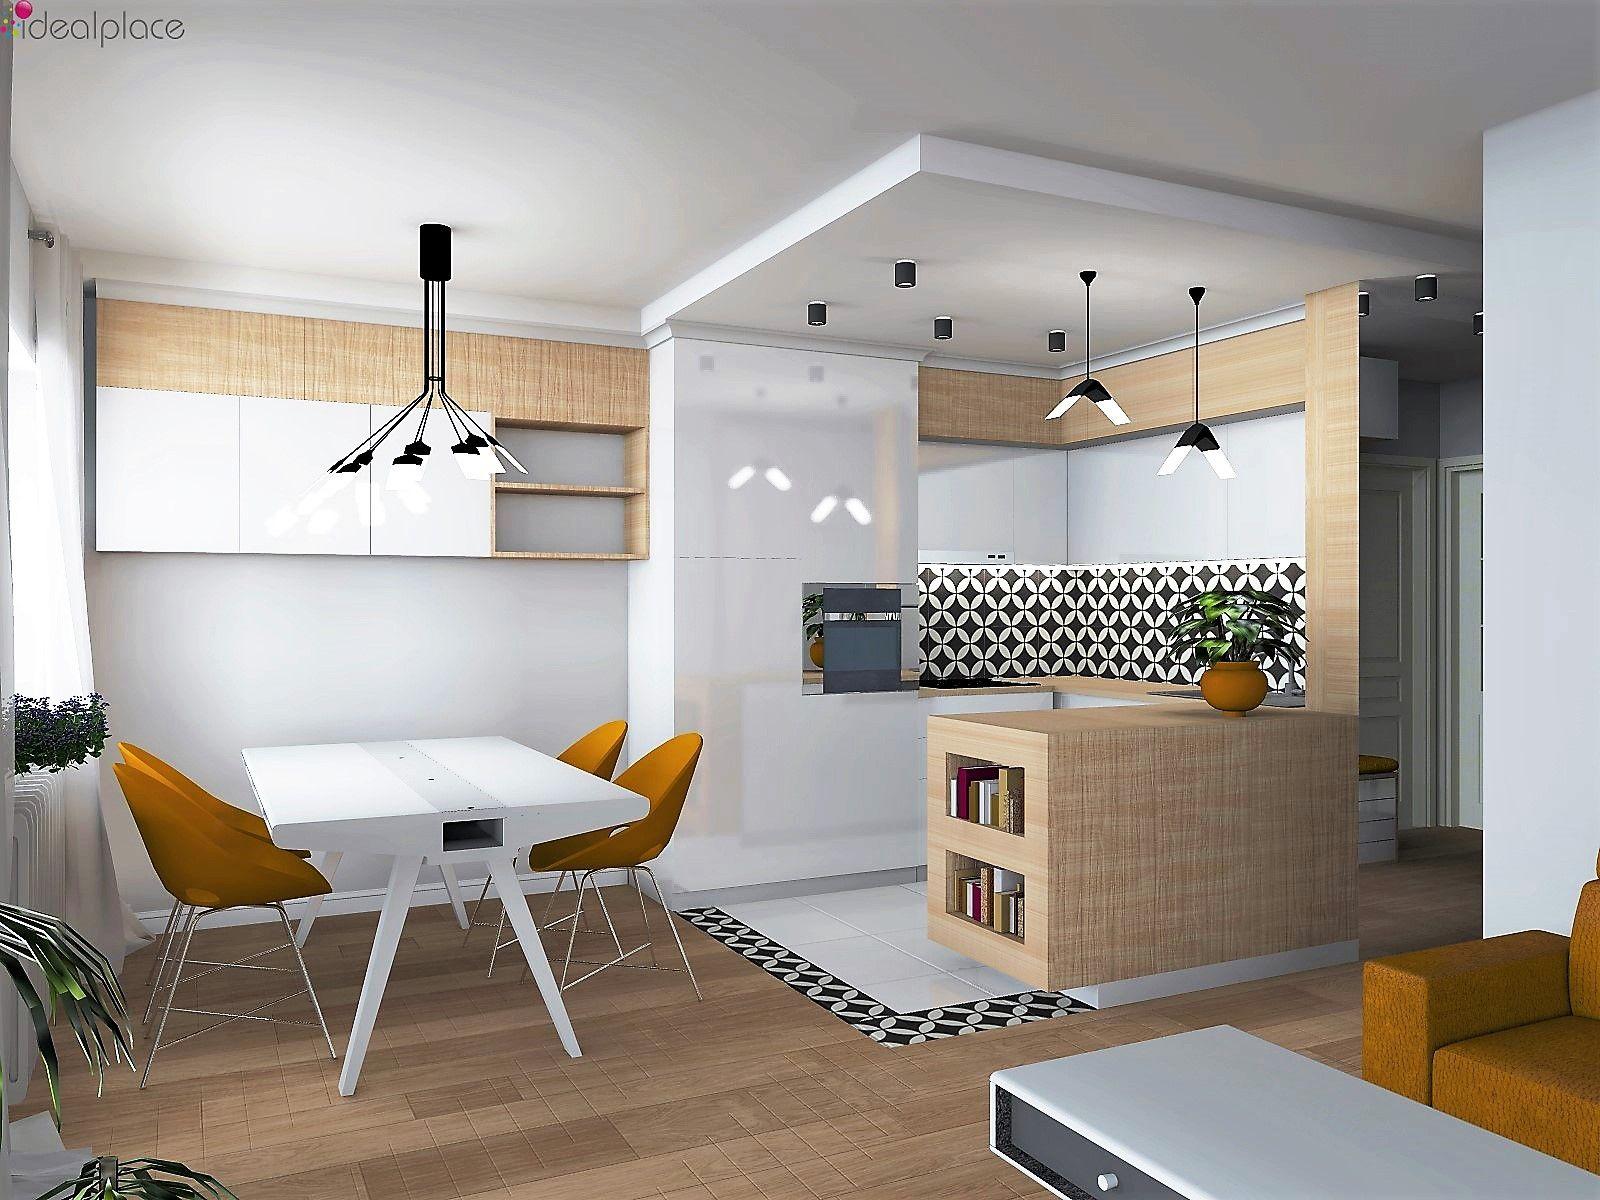 Projekt Mieszkania Chorzow Salon Z Aneksem Kuchennym Plytki Cementowe Oswietlenie Xcellent Flight I Um Kitchen Design Decor Contemporary Kitchen Home Decor